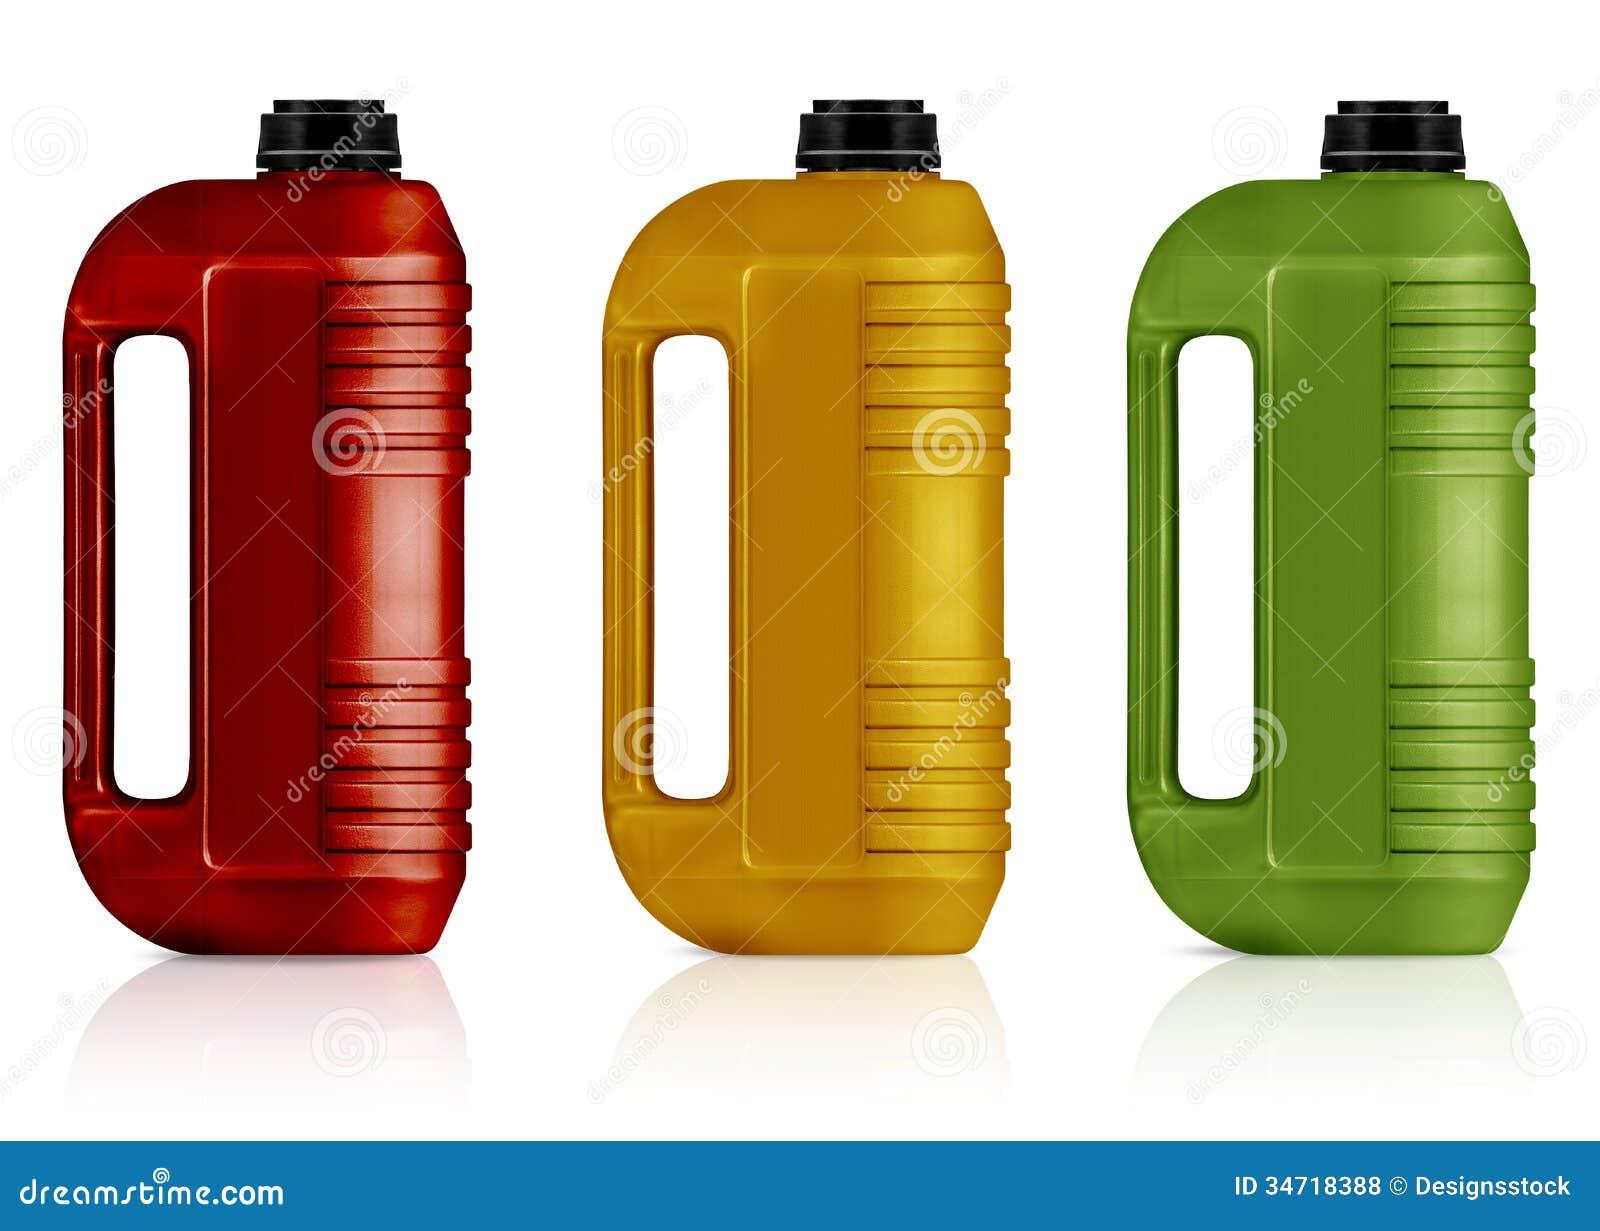 Plastic Gallon Royalty Free Stock Photos Image 34718388